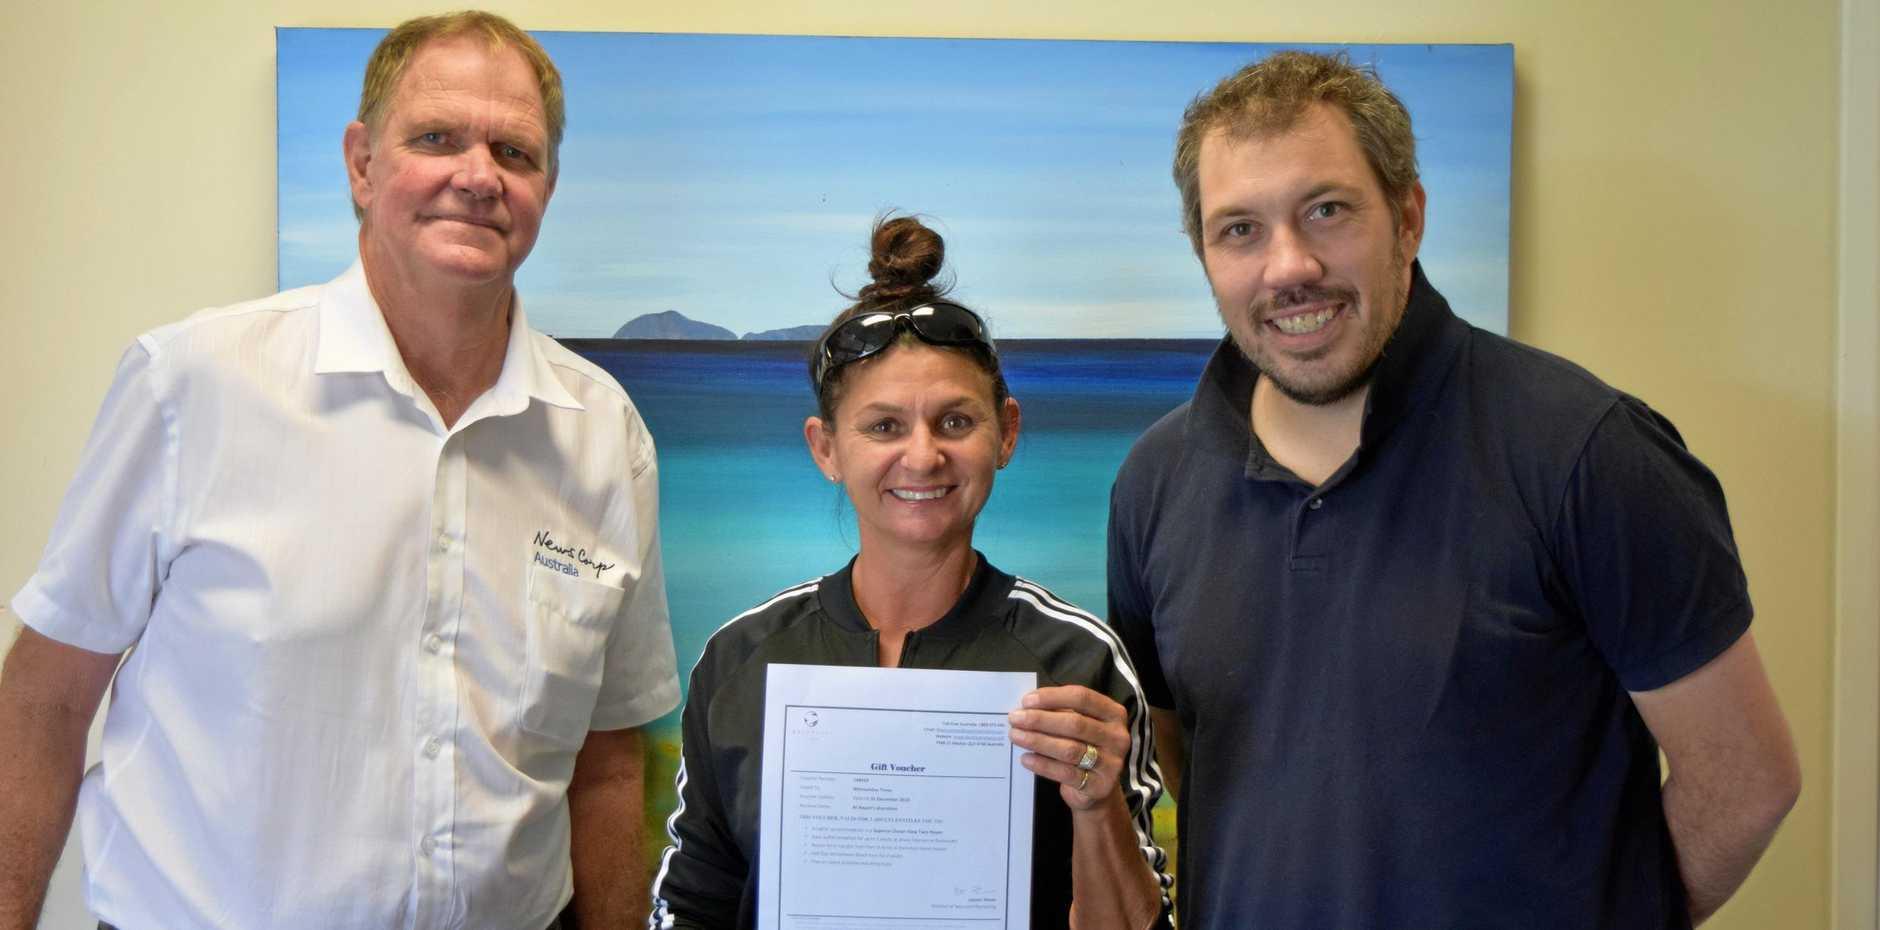 SWEET SUCCESS: Whitsundays general manager Stephen Darwen, competition winner Sara Gorman and Whitsundays regional editor Gregor Mactaggart.